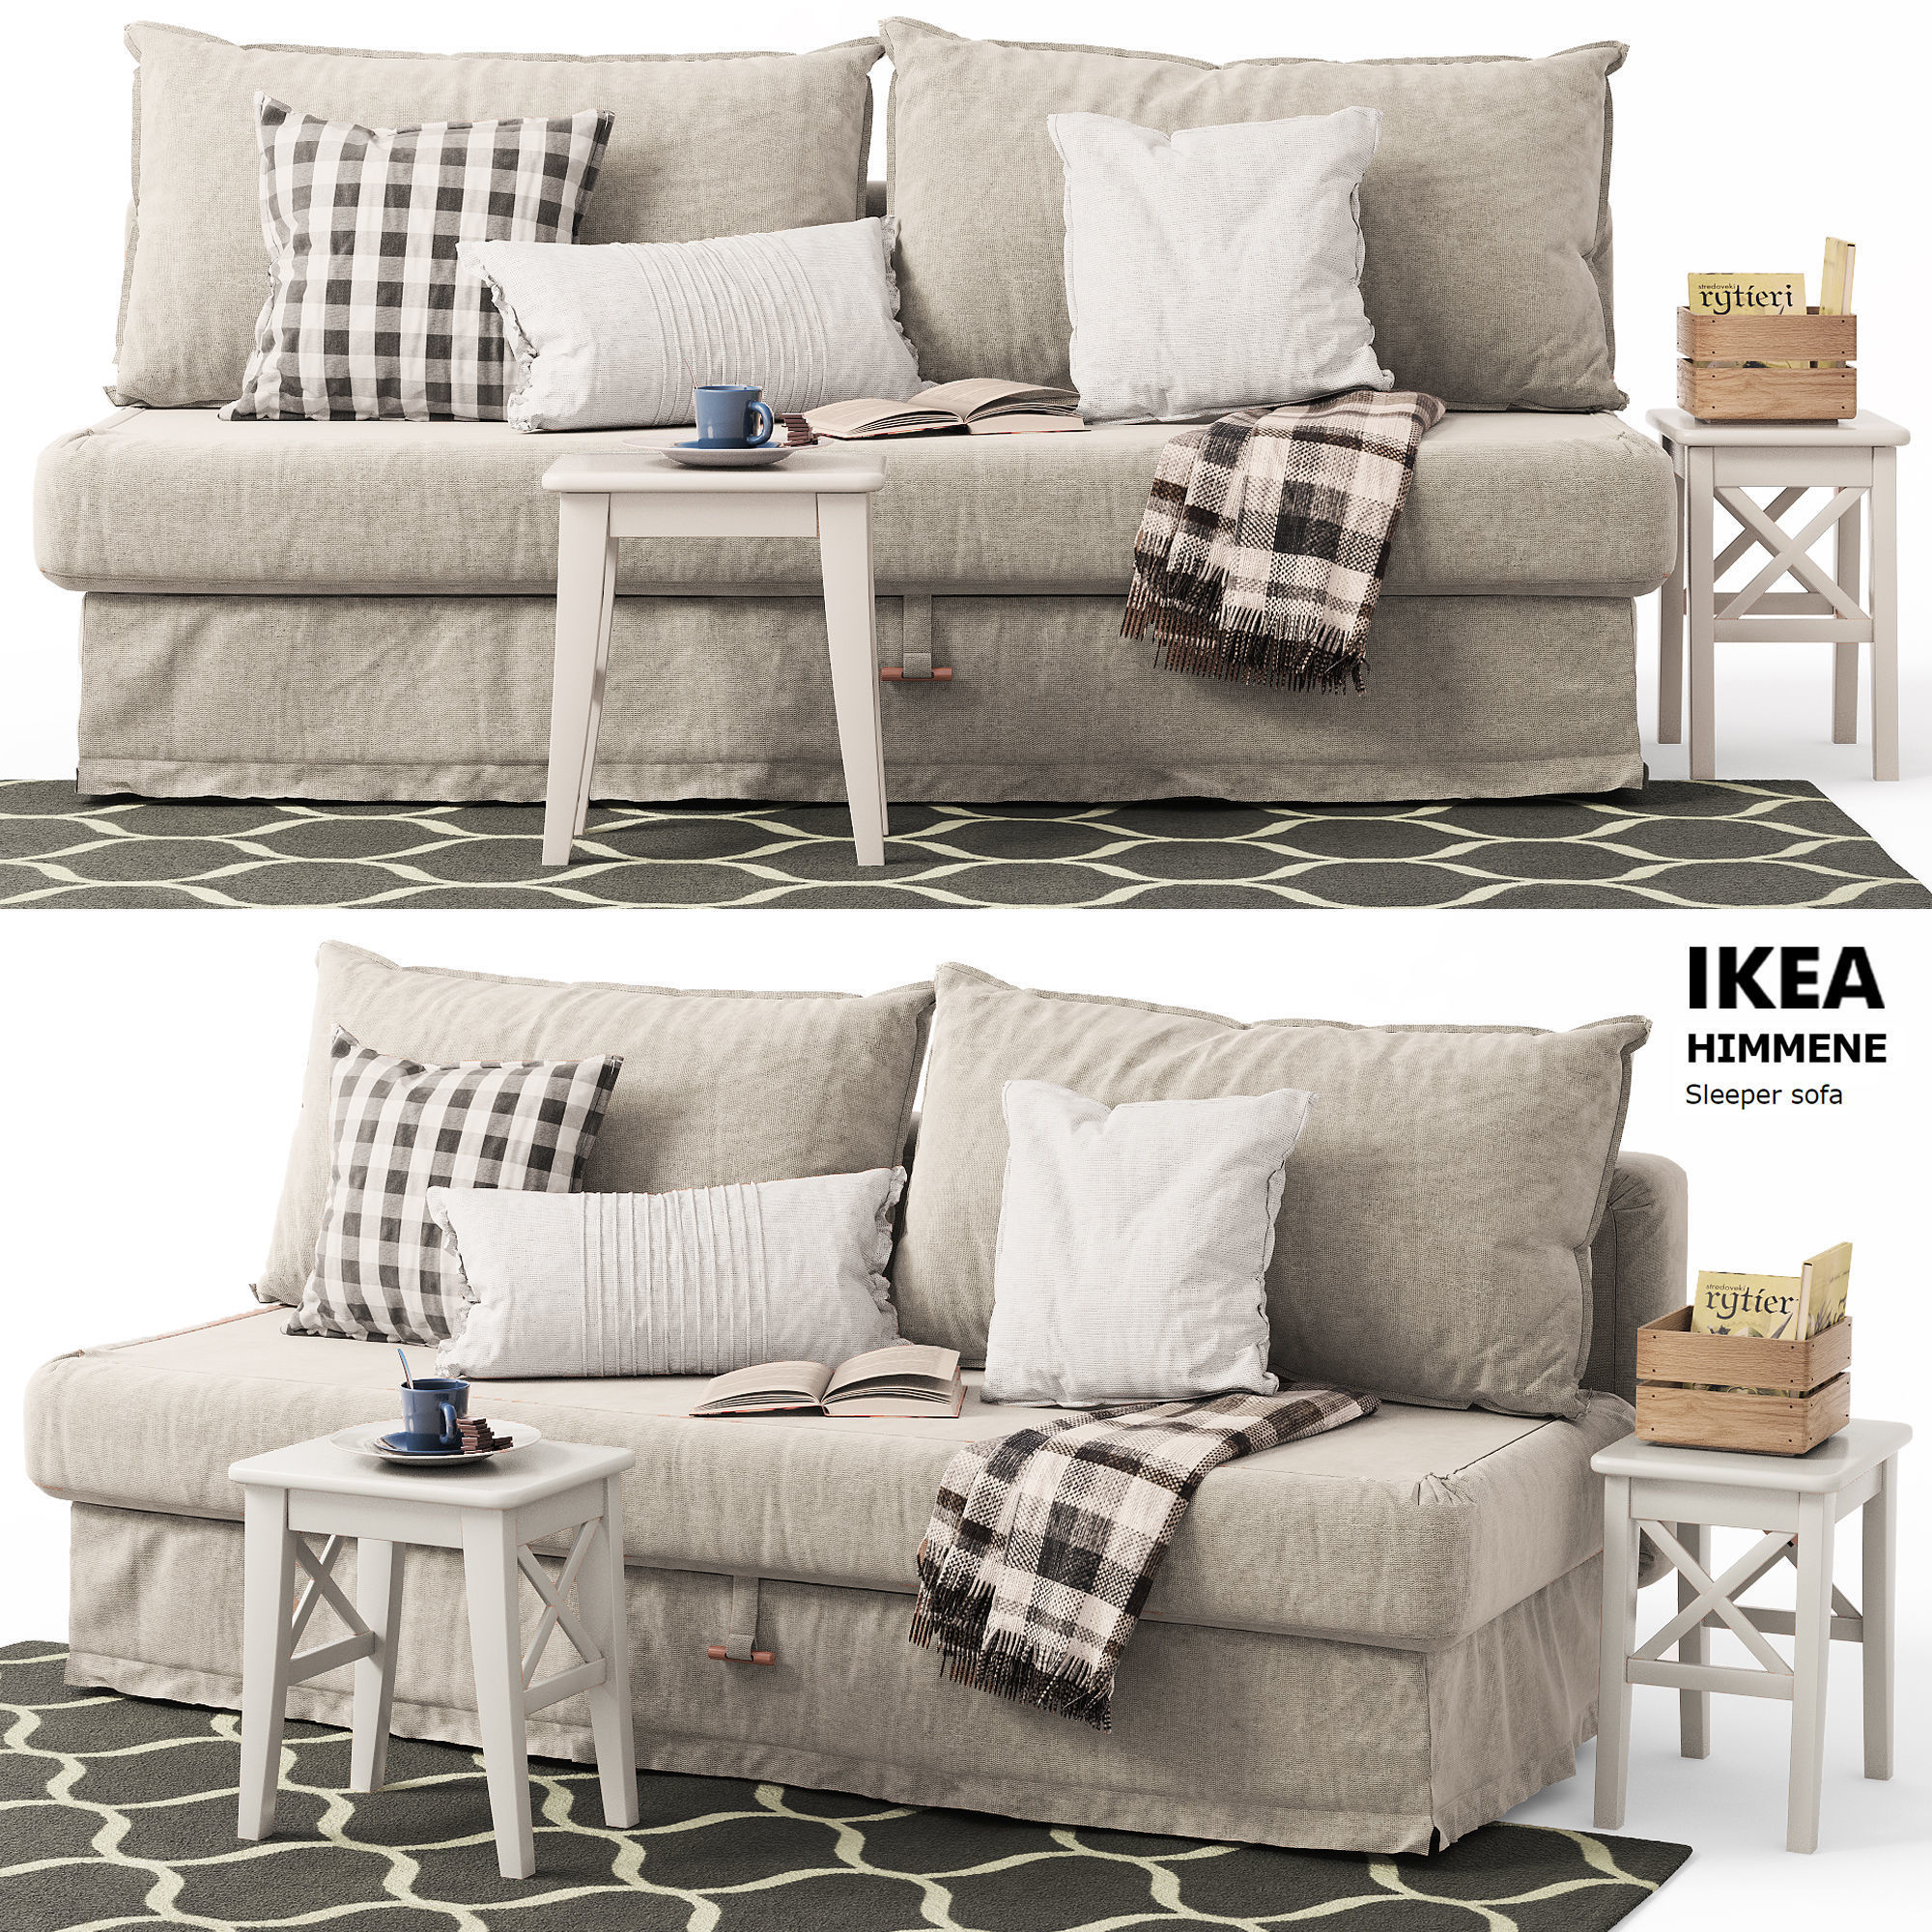 designer fashion 1bf1a 6a033 Sleeper sofa HIMMENE Ikea   3D model